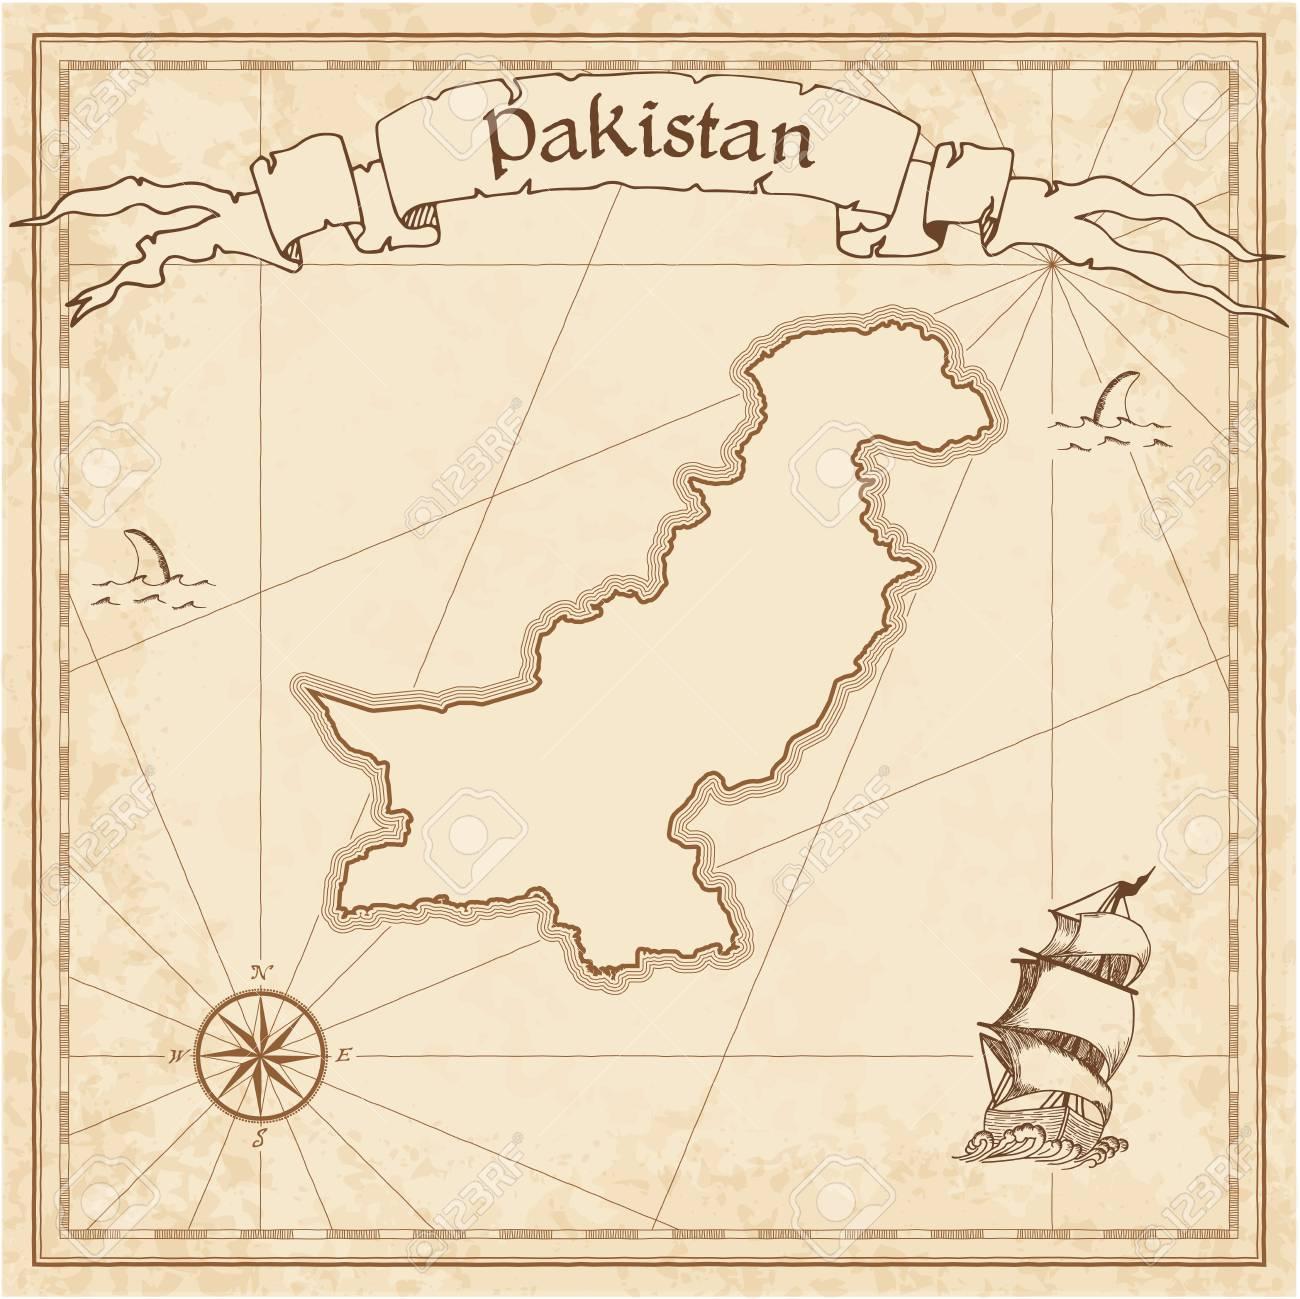 Pakistán Antiguo Mapa Del Tesoro. Sepia Grabada Plantilla De Mapa ...